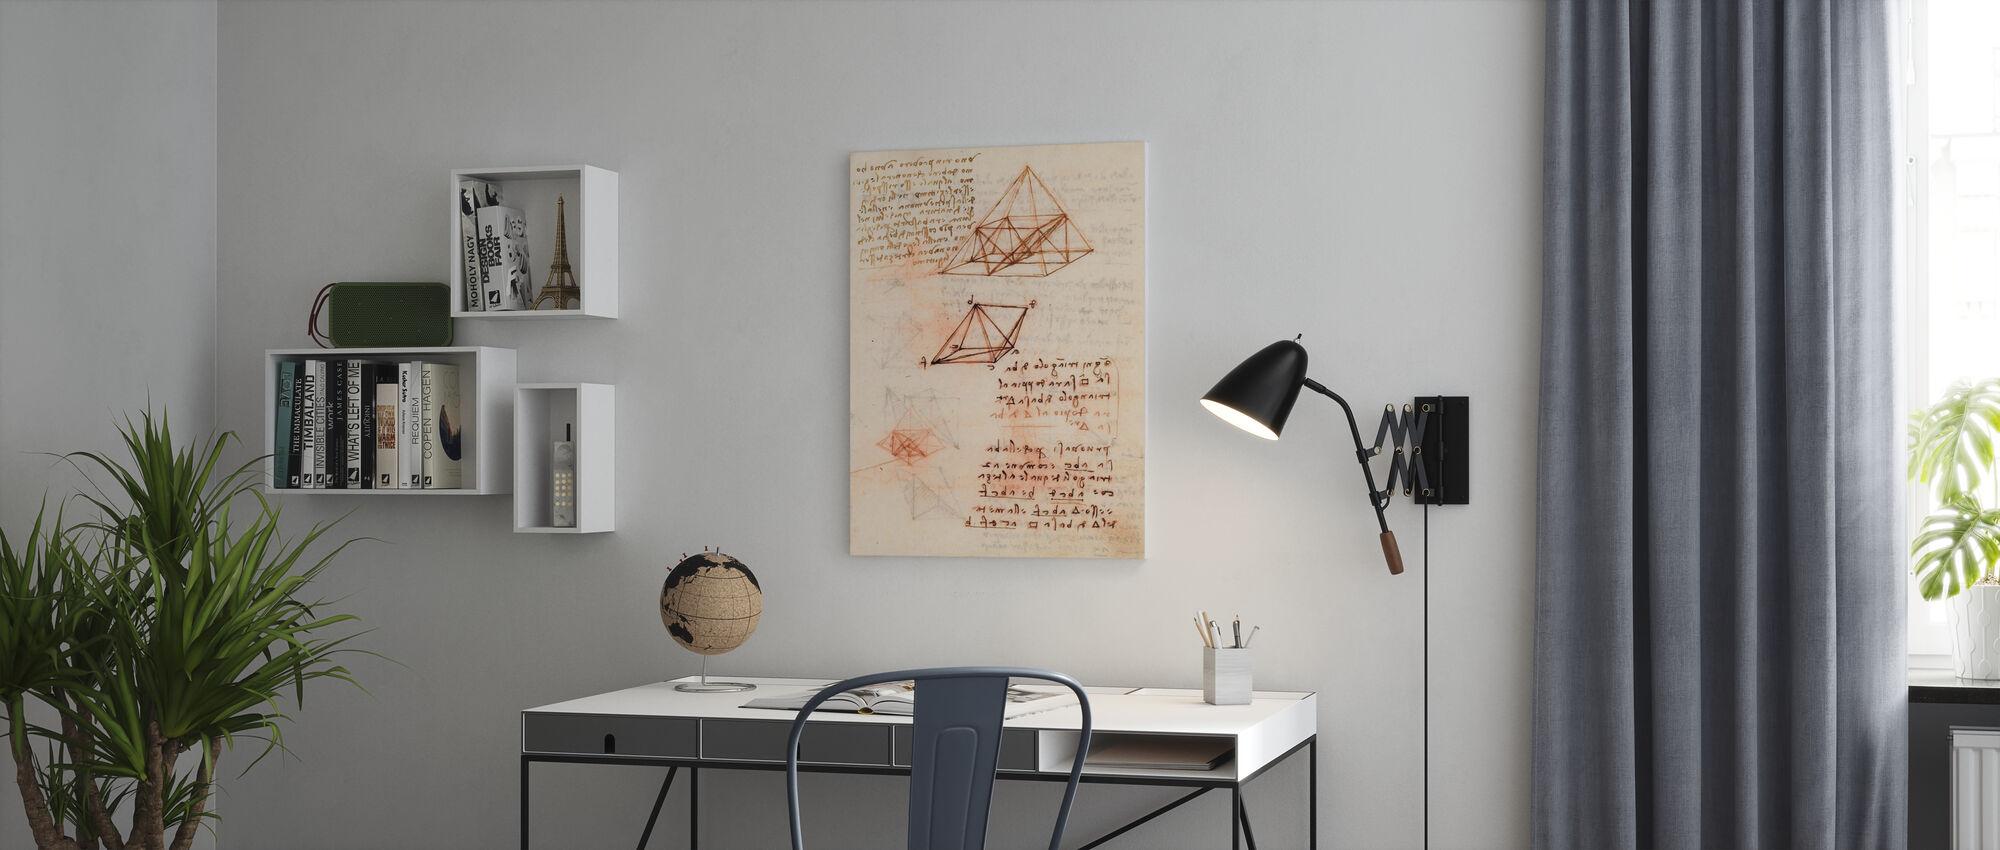 Codex Madrid II - Leonardo Da Vinci - Canvas print - Office